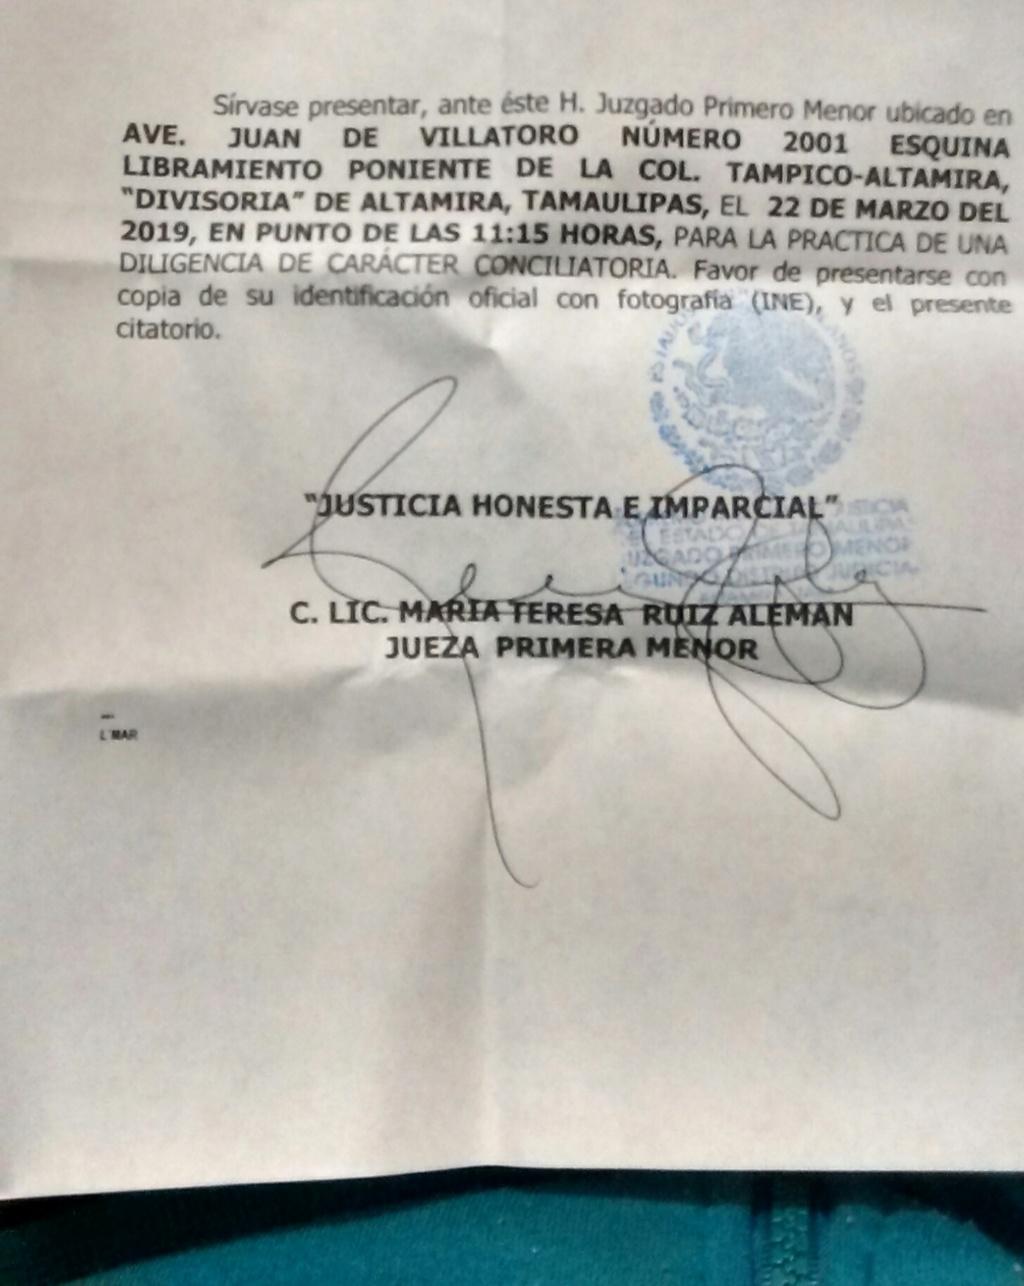 carta jurídica conciliación Img_2011